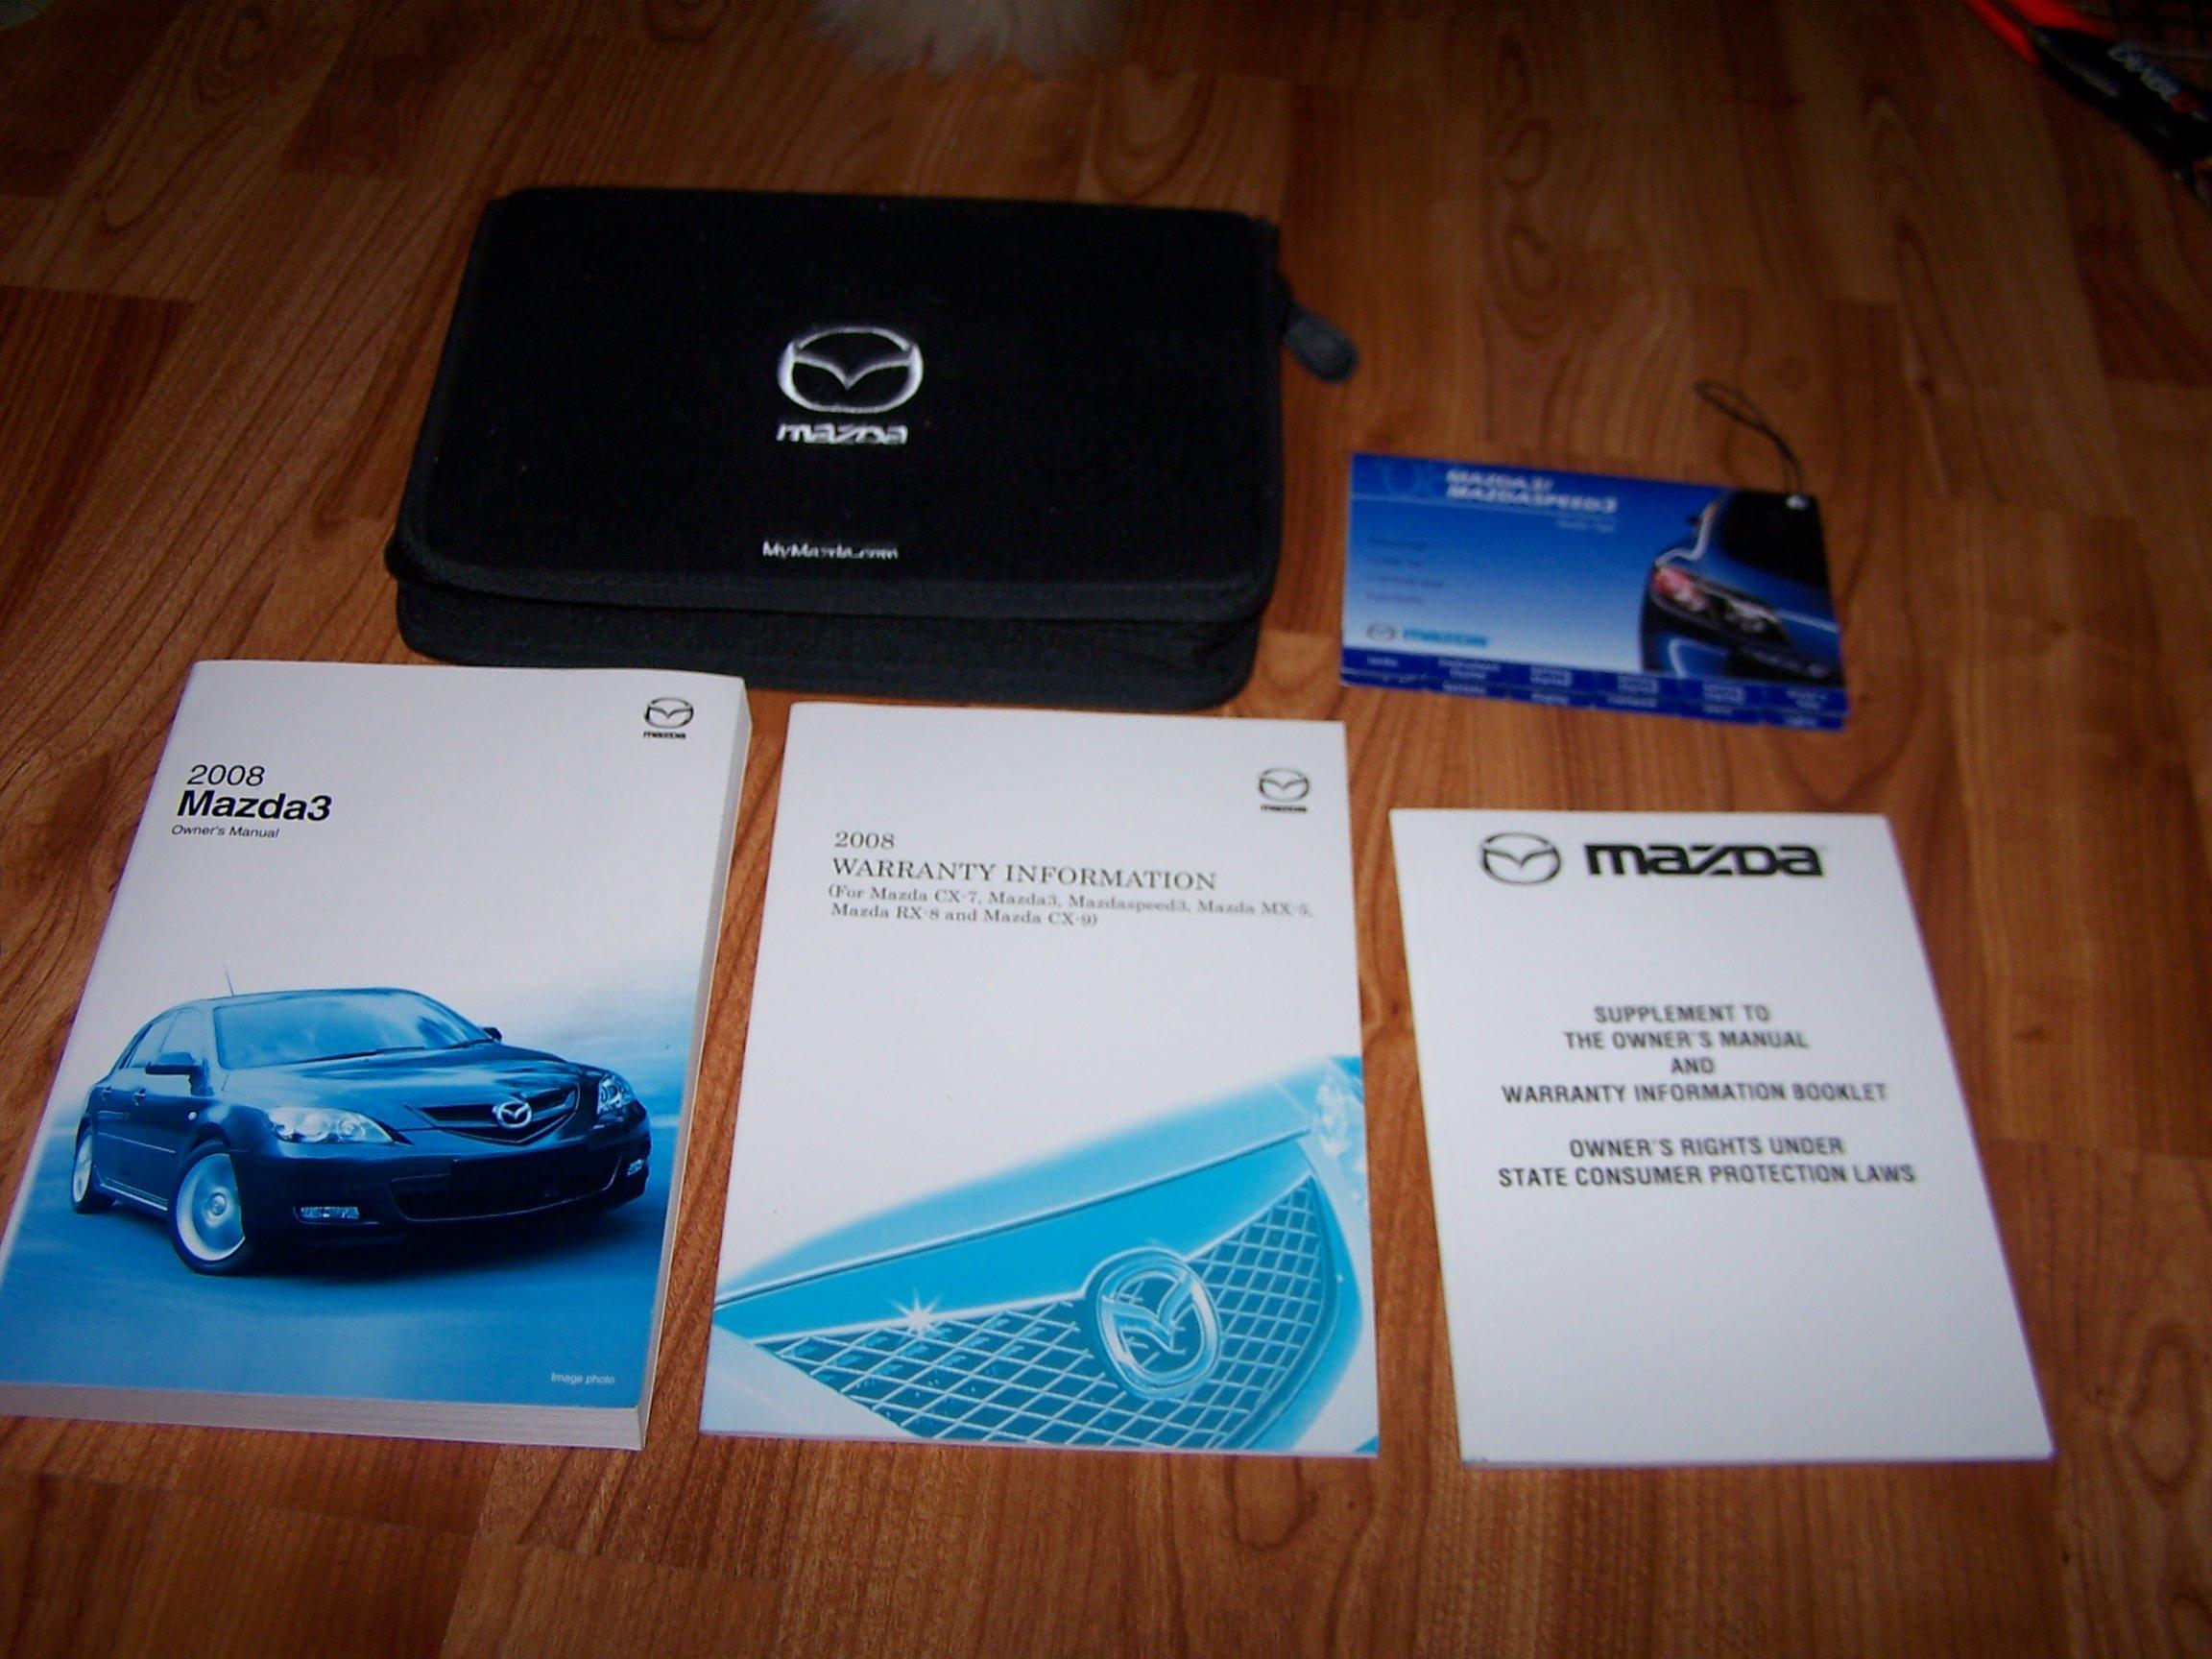 2016 mazda 3 owners manual: mazda: amazon. Com: books.